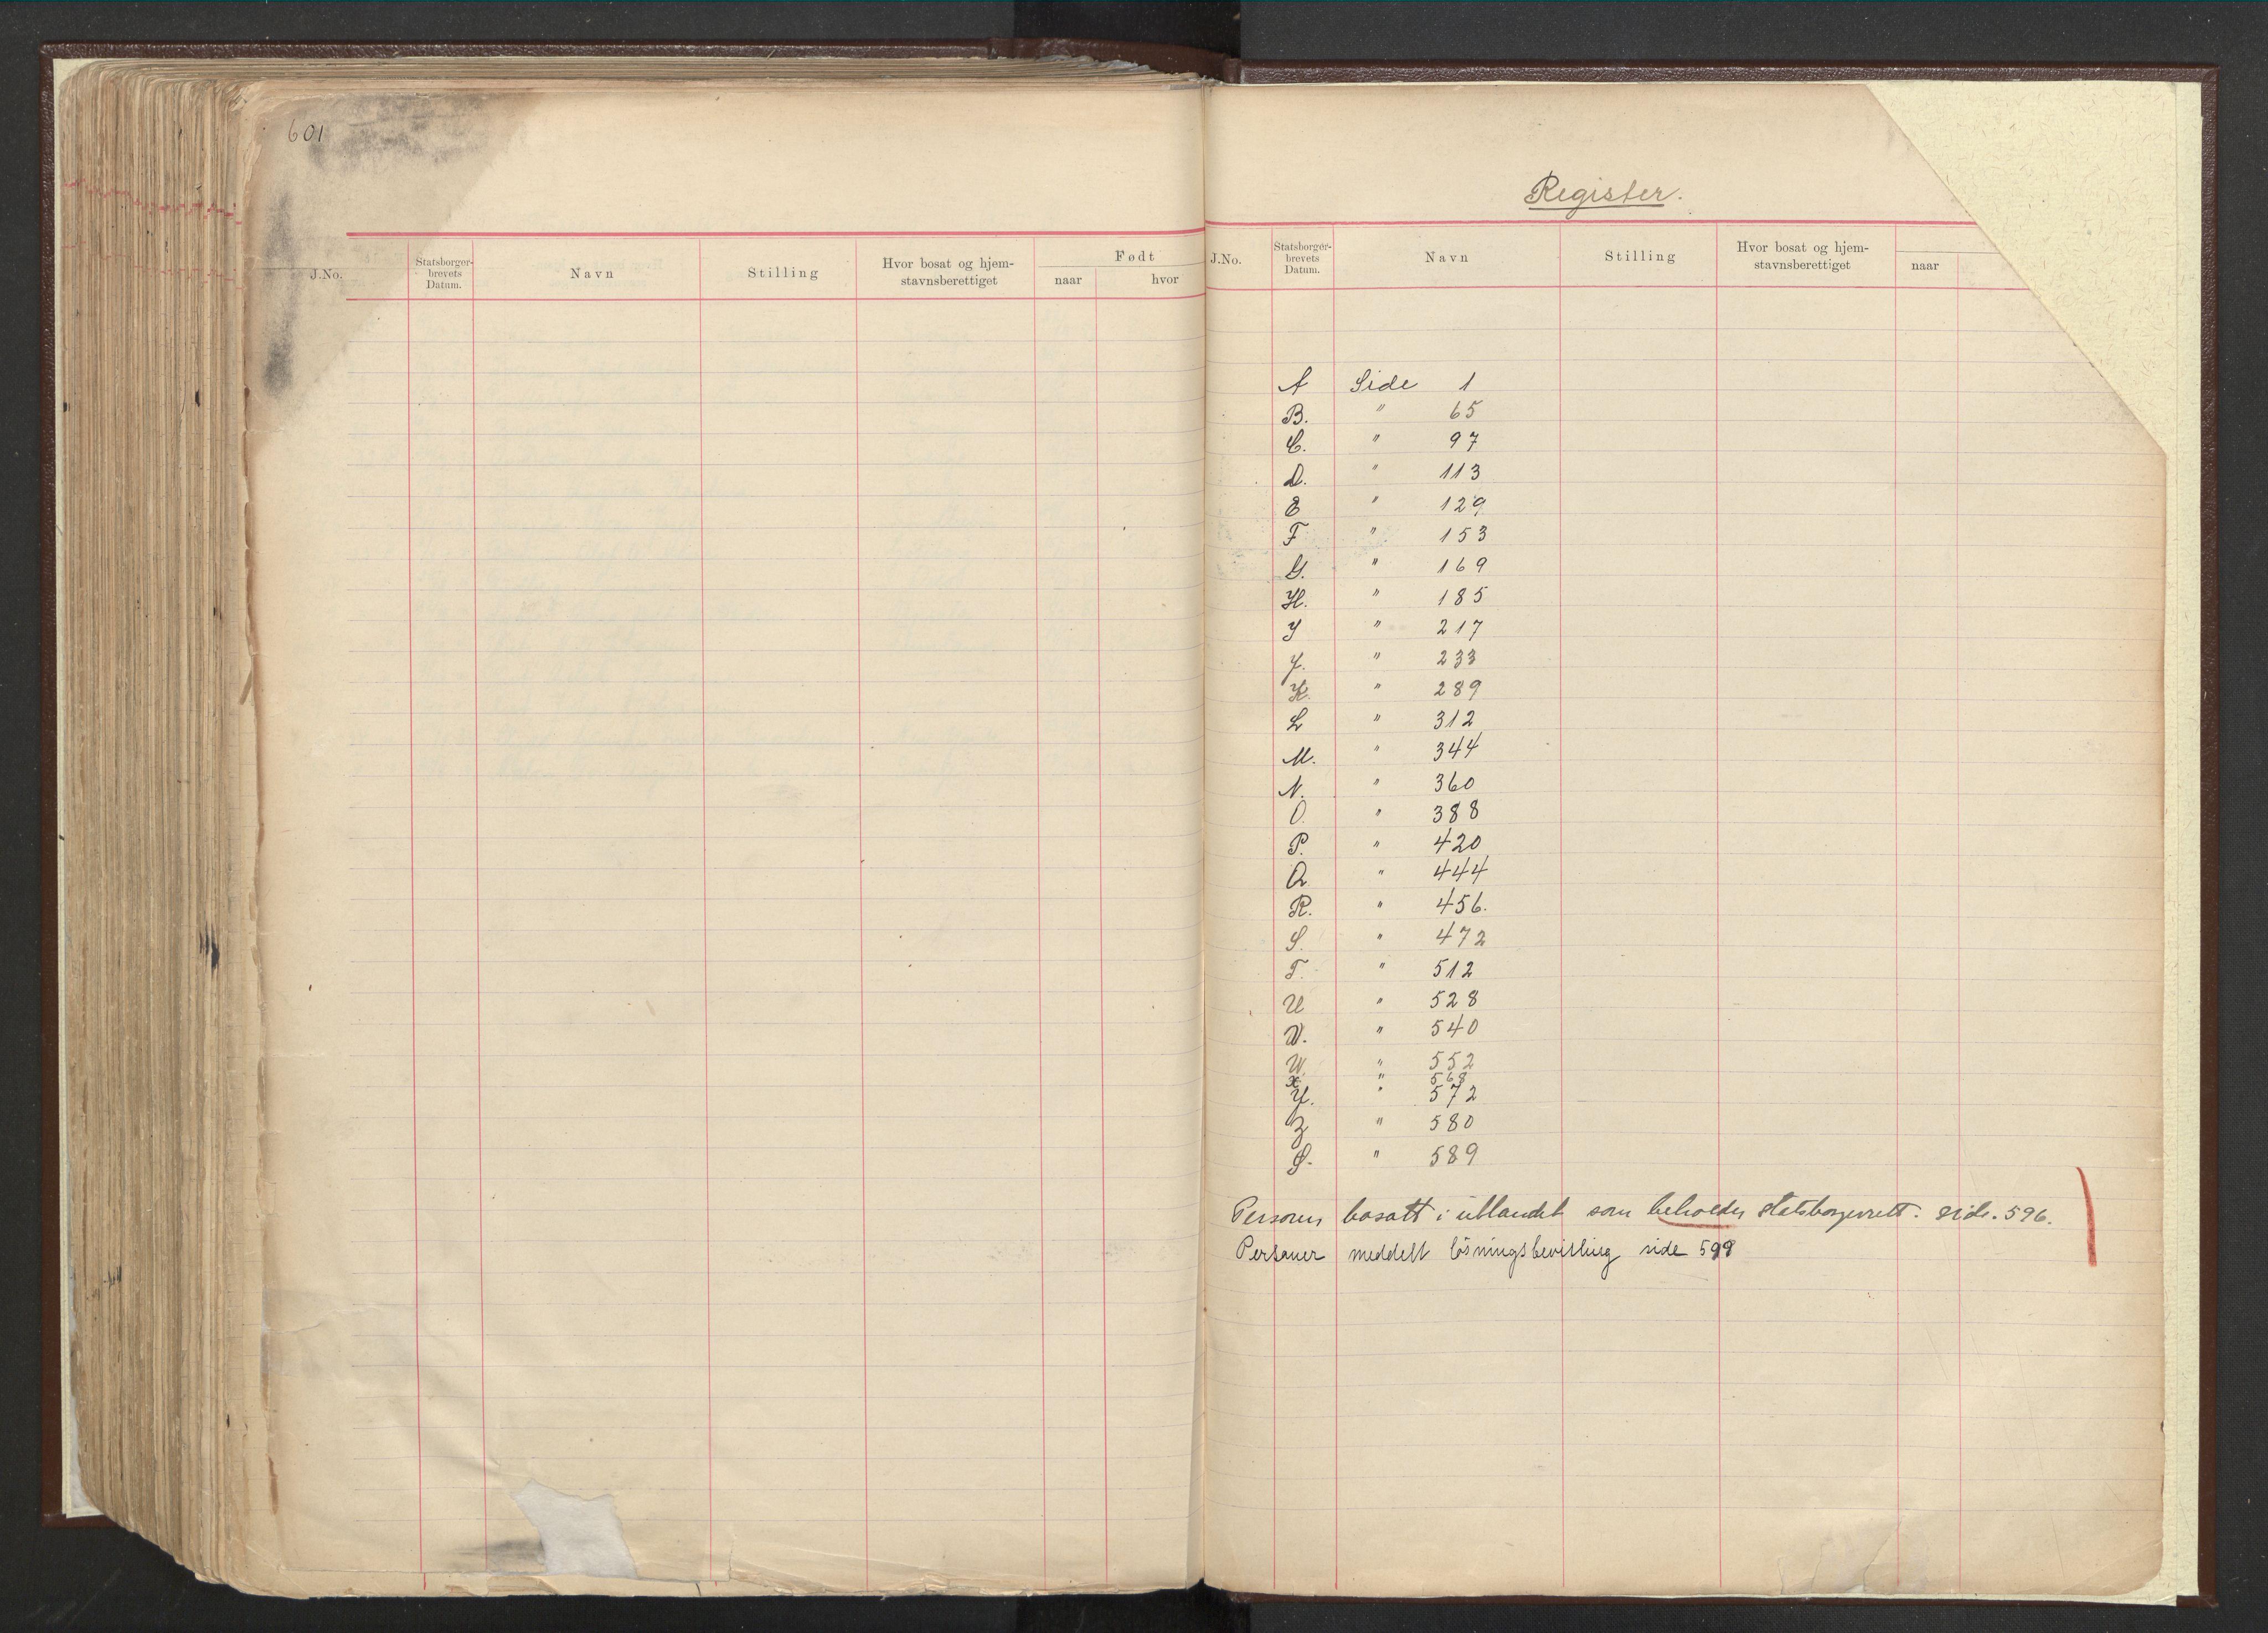 RA, Justisdepartementet, 3. politikontor P3, C/Cc/L0001: Journal over statsborgersaker, 1891-1946, s. 601-602